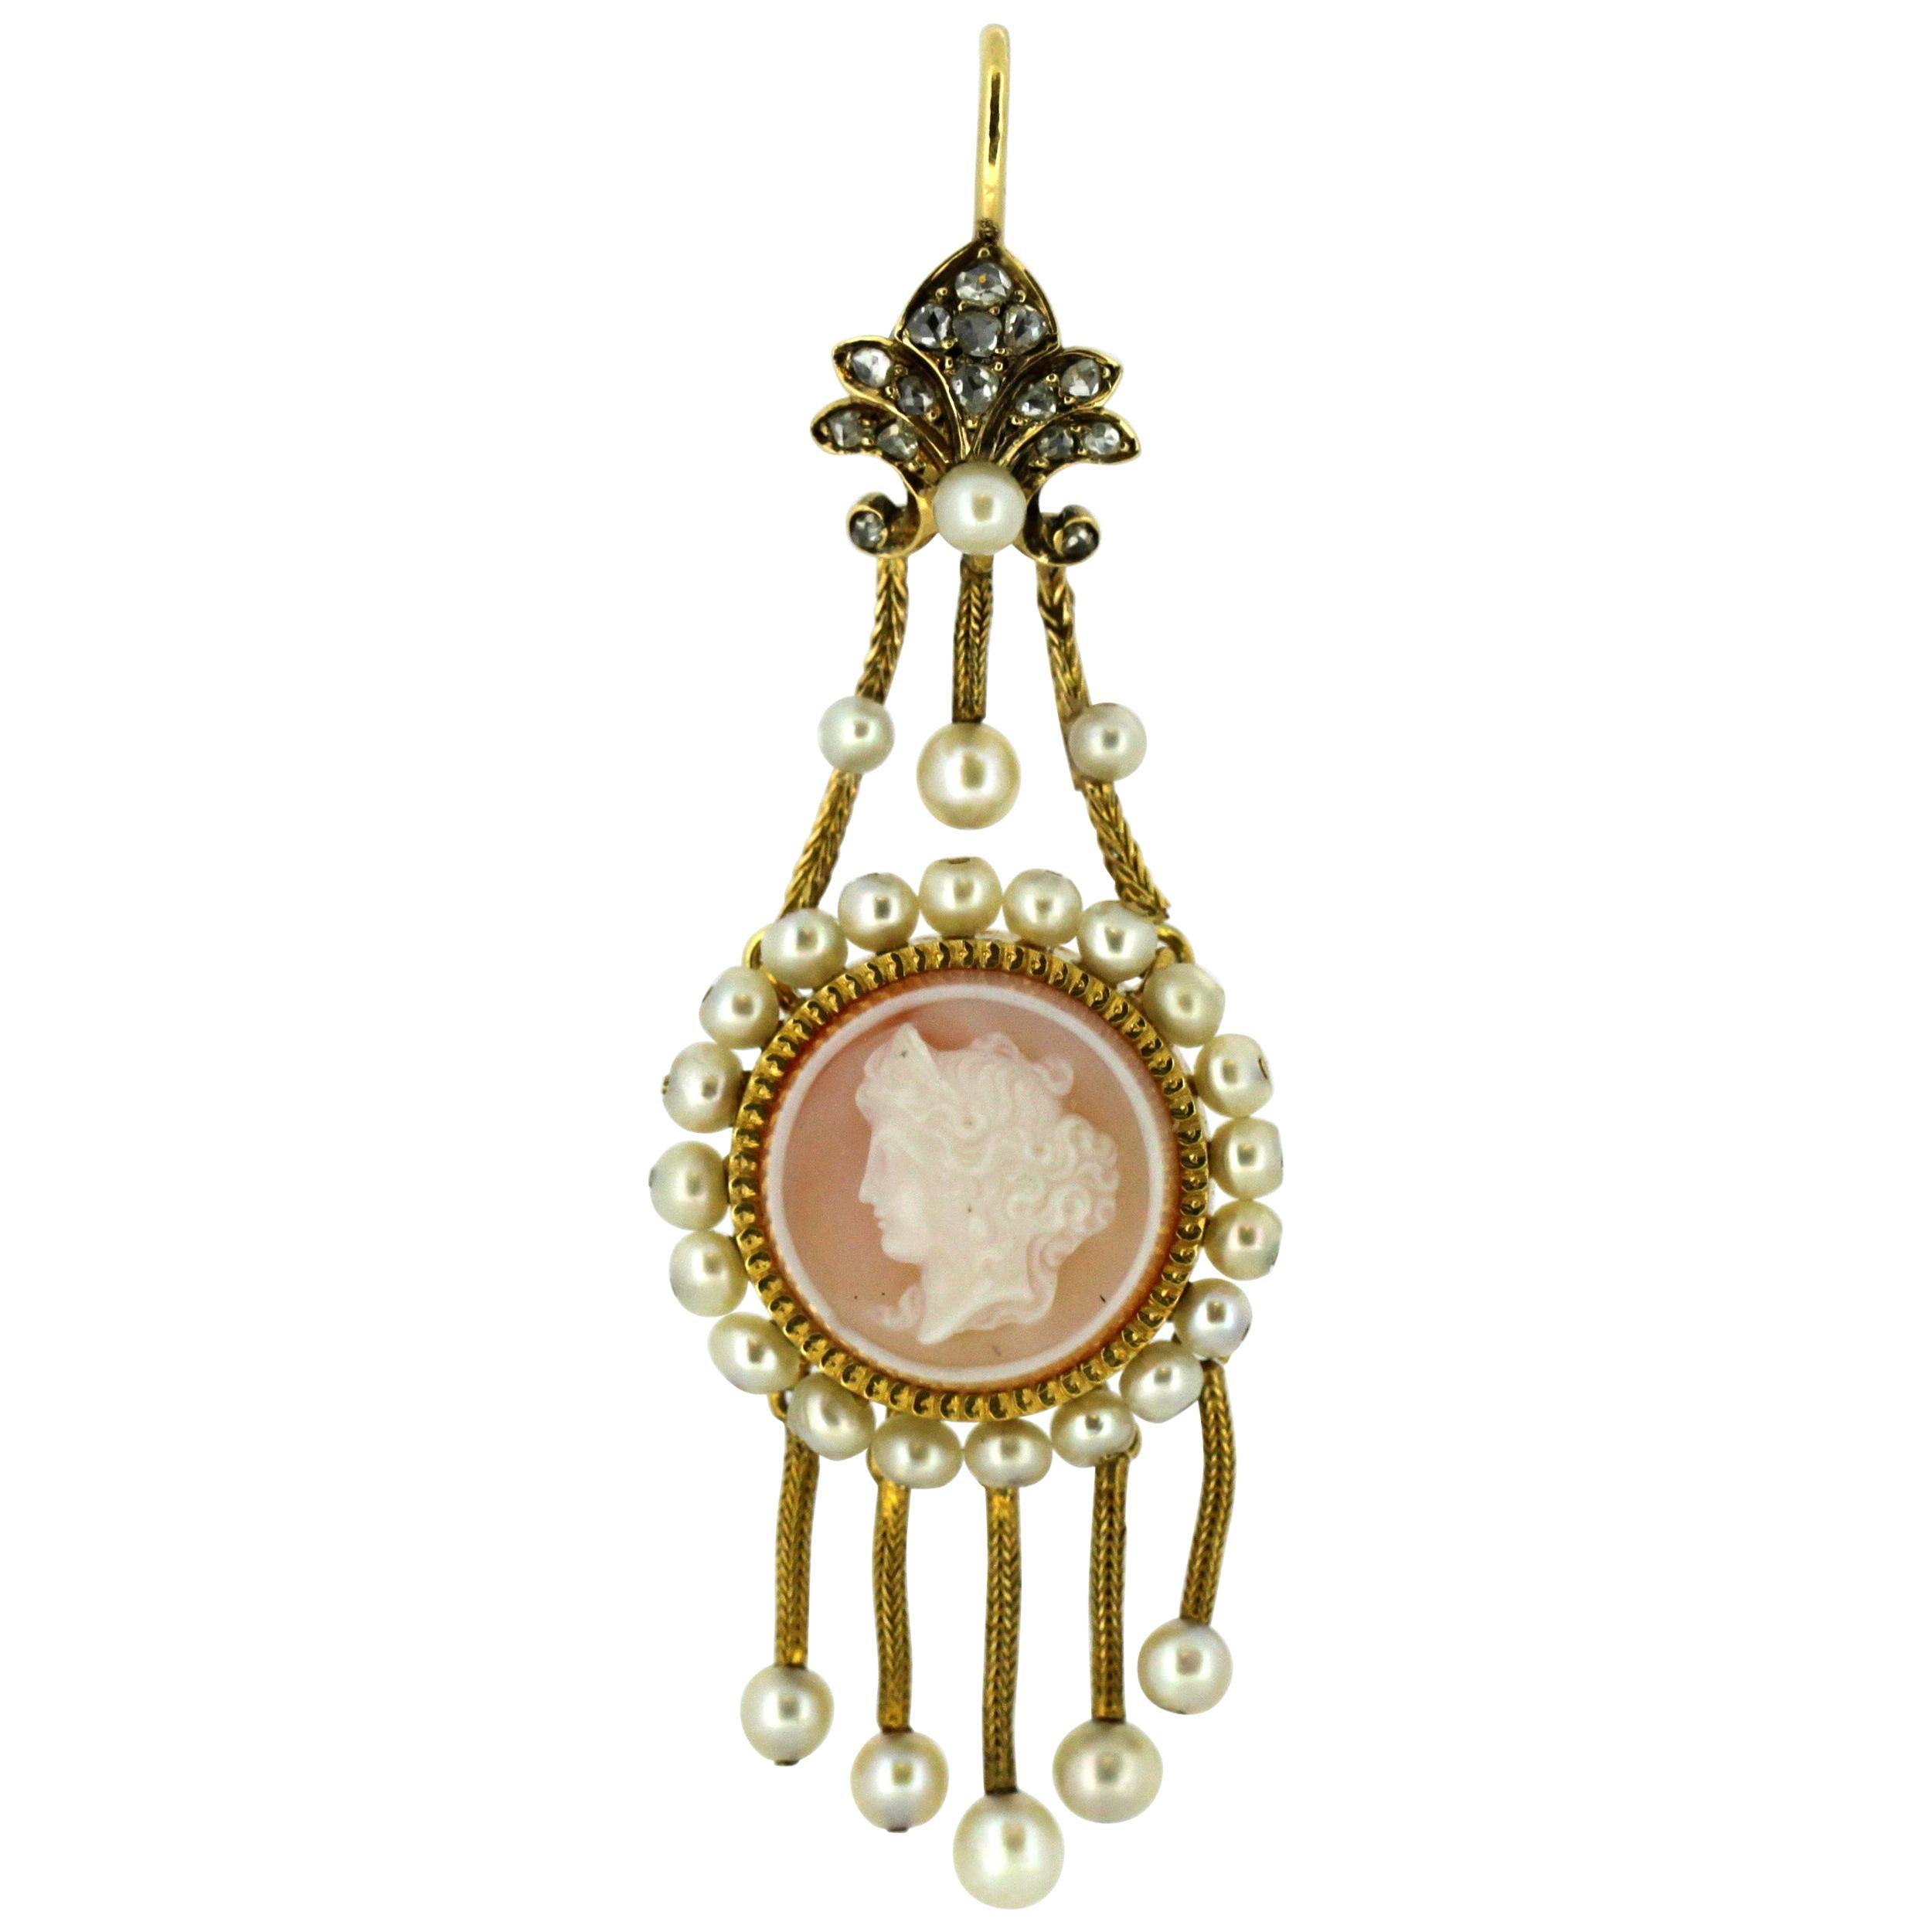 Victorian 15 Karat Gold Shell Cameo on Carnelian Pendant, Diamonds and Pearls